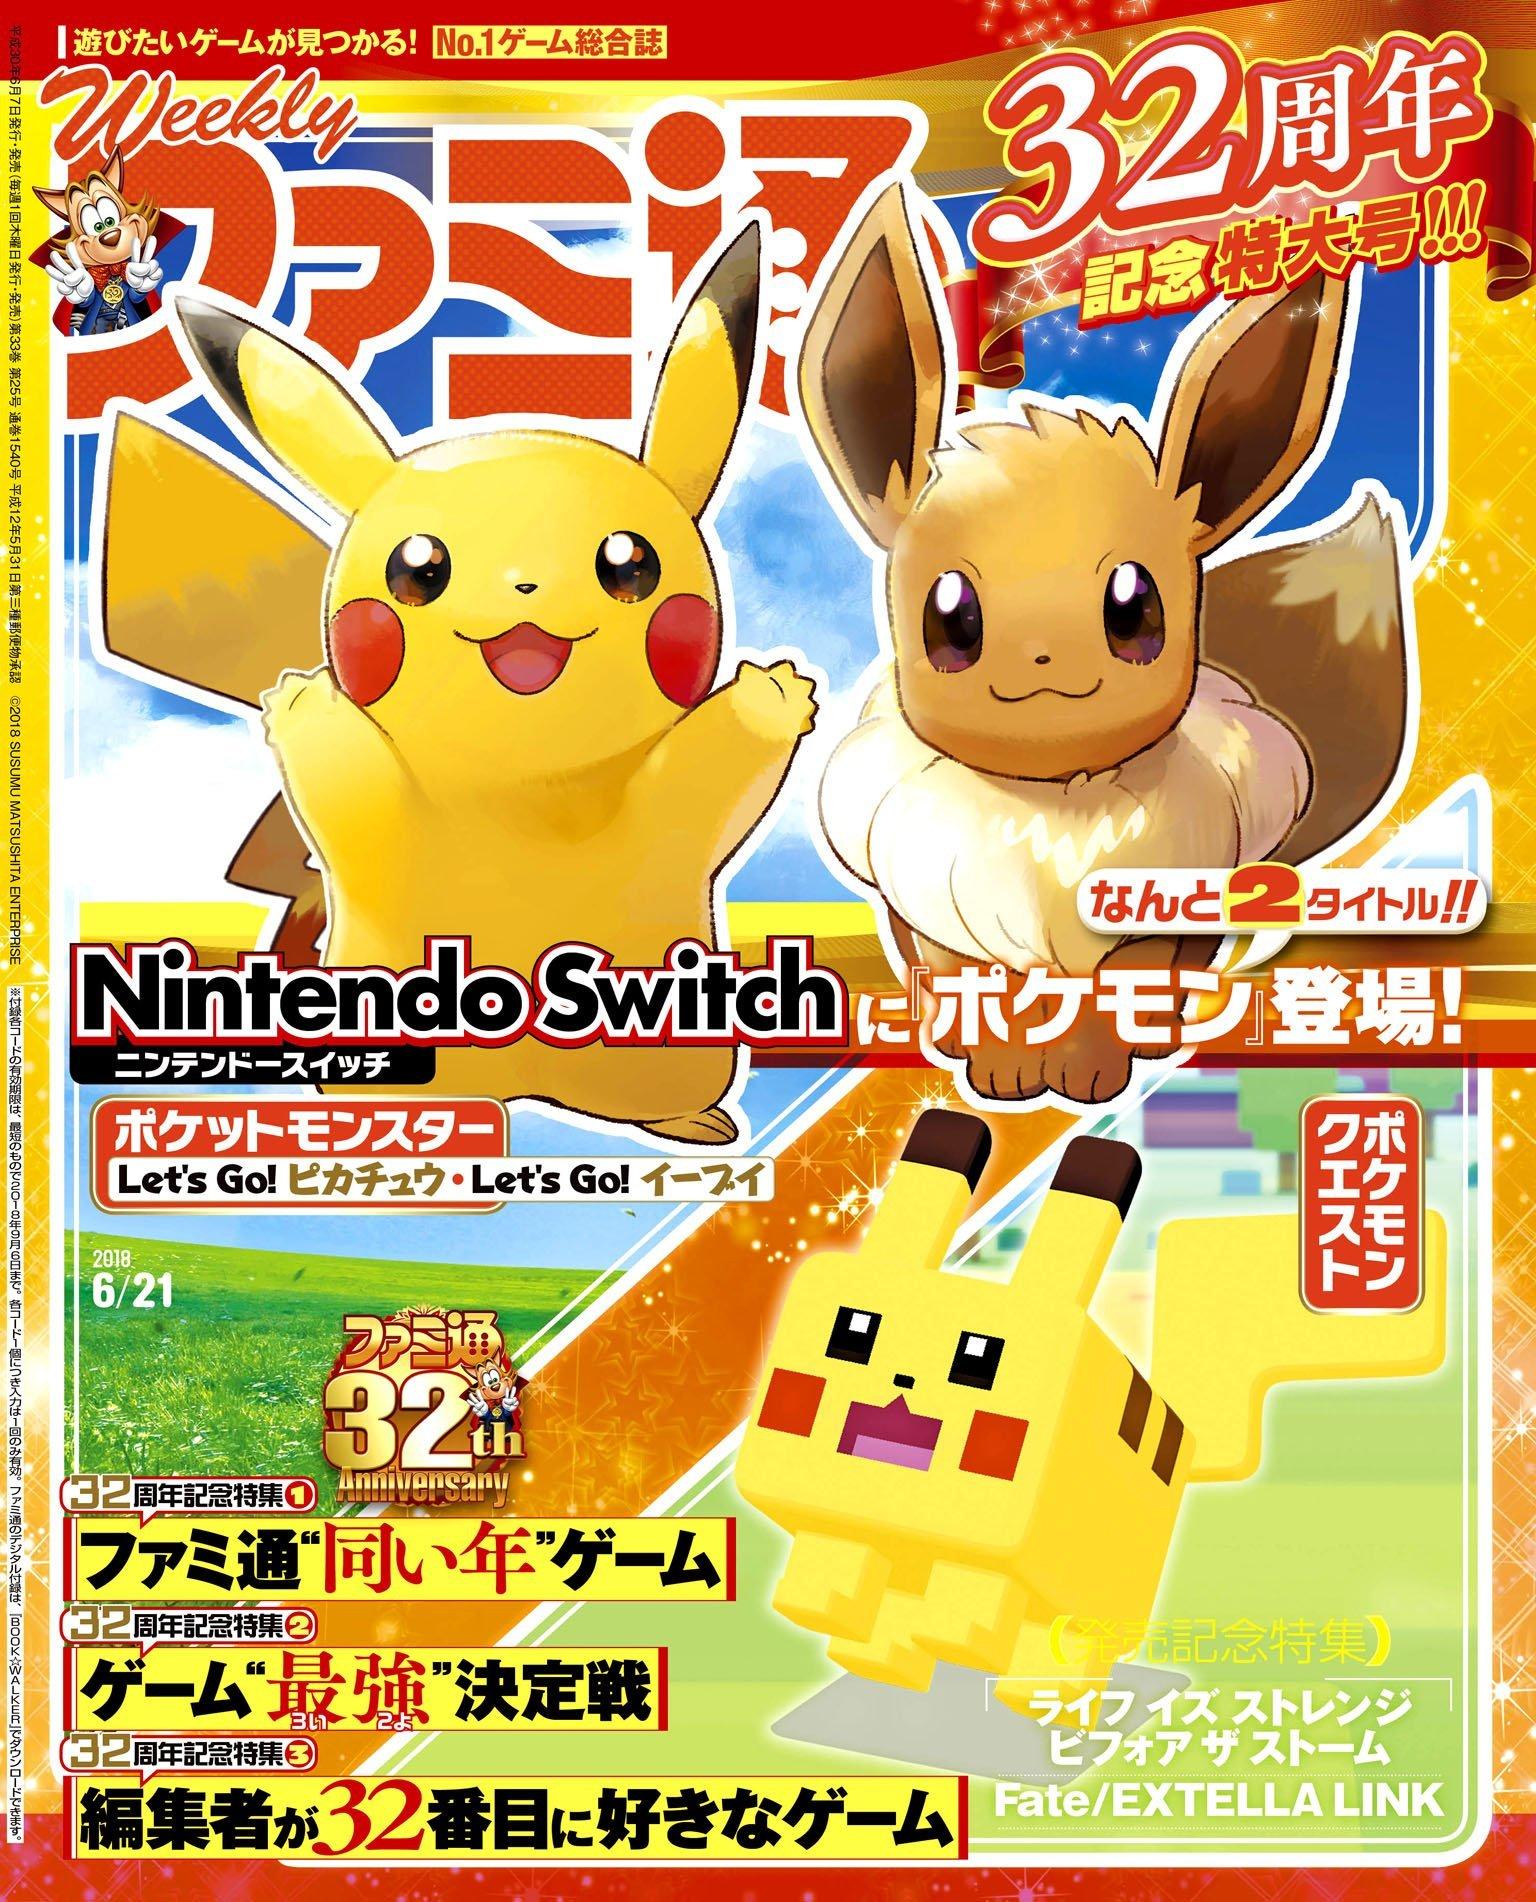 Famitsu 1540 (June 21, 2018)